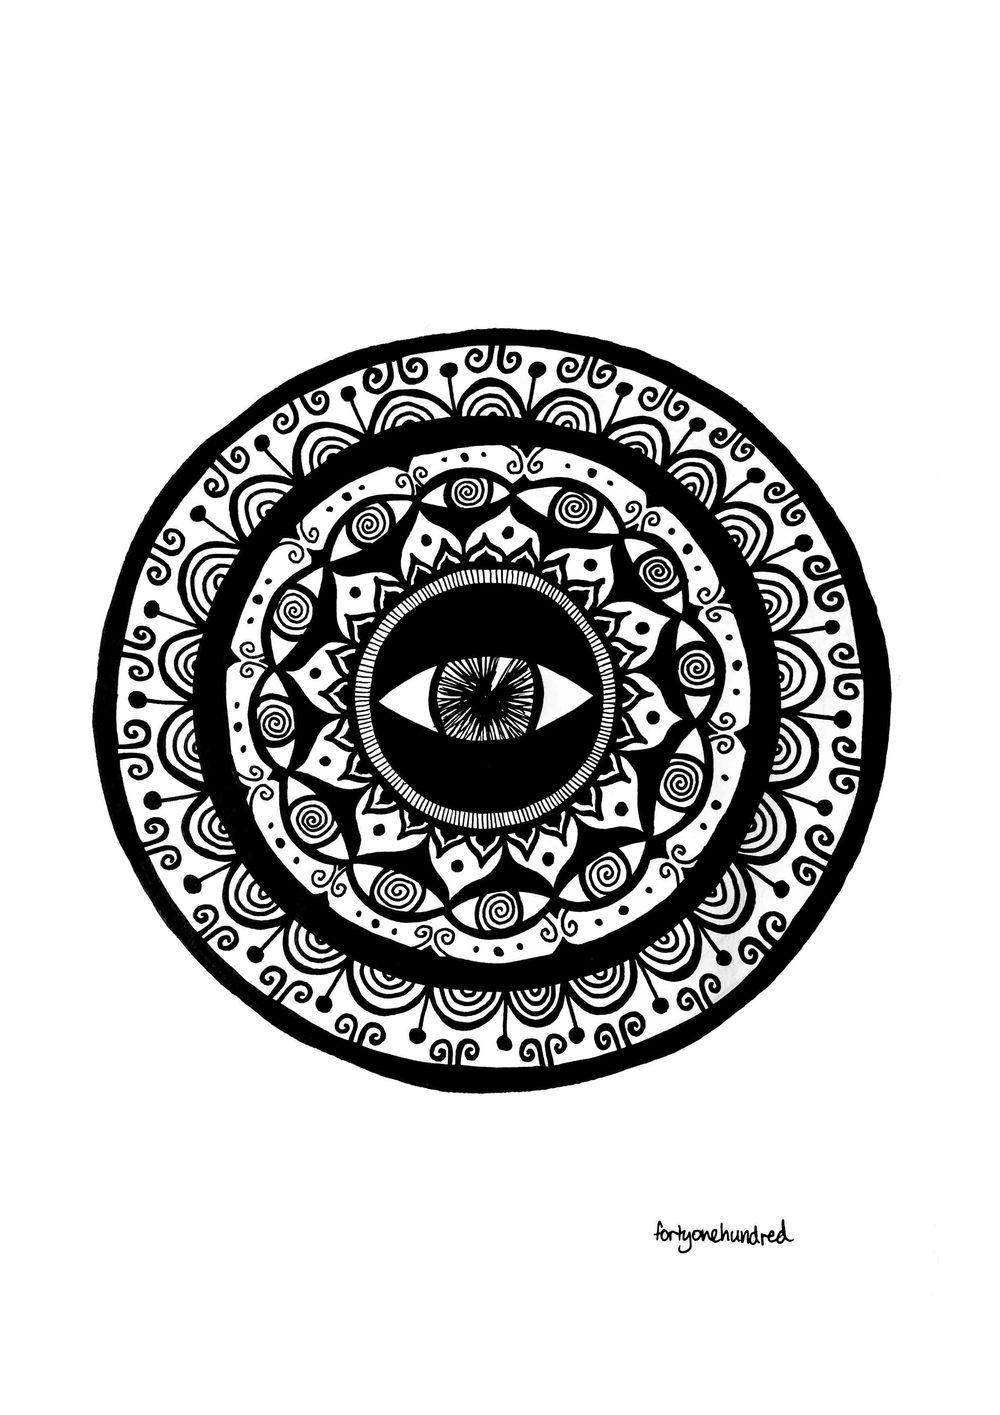 eyedsdn.jpg